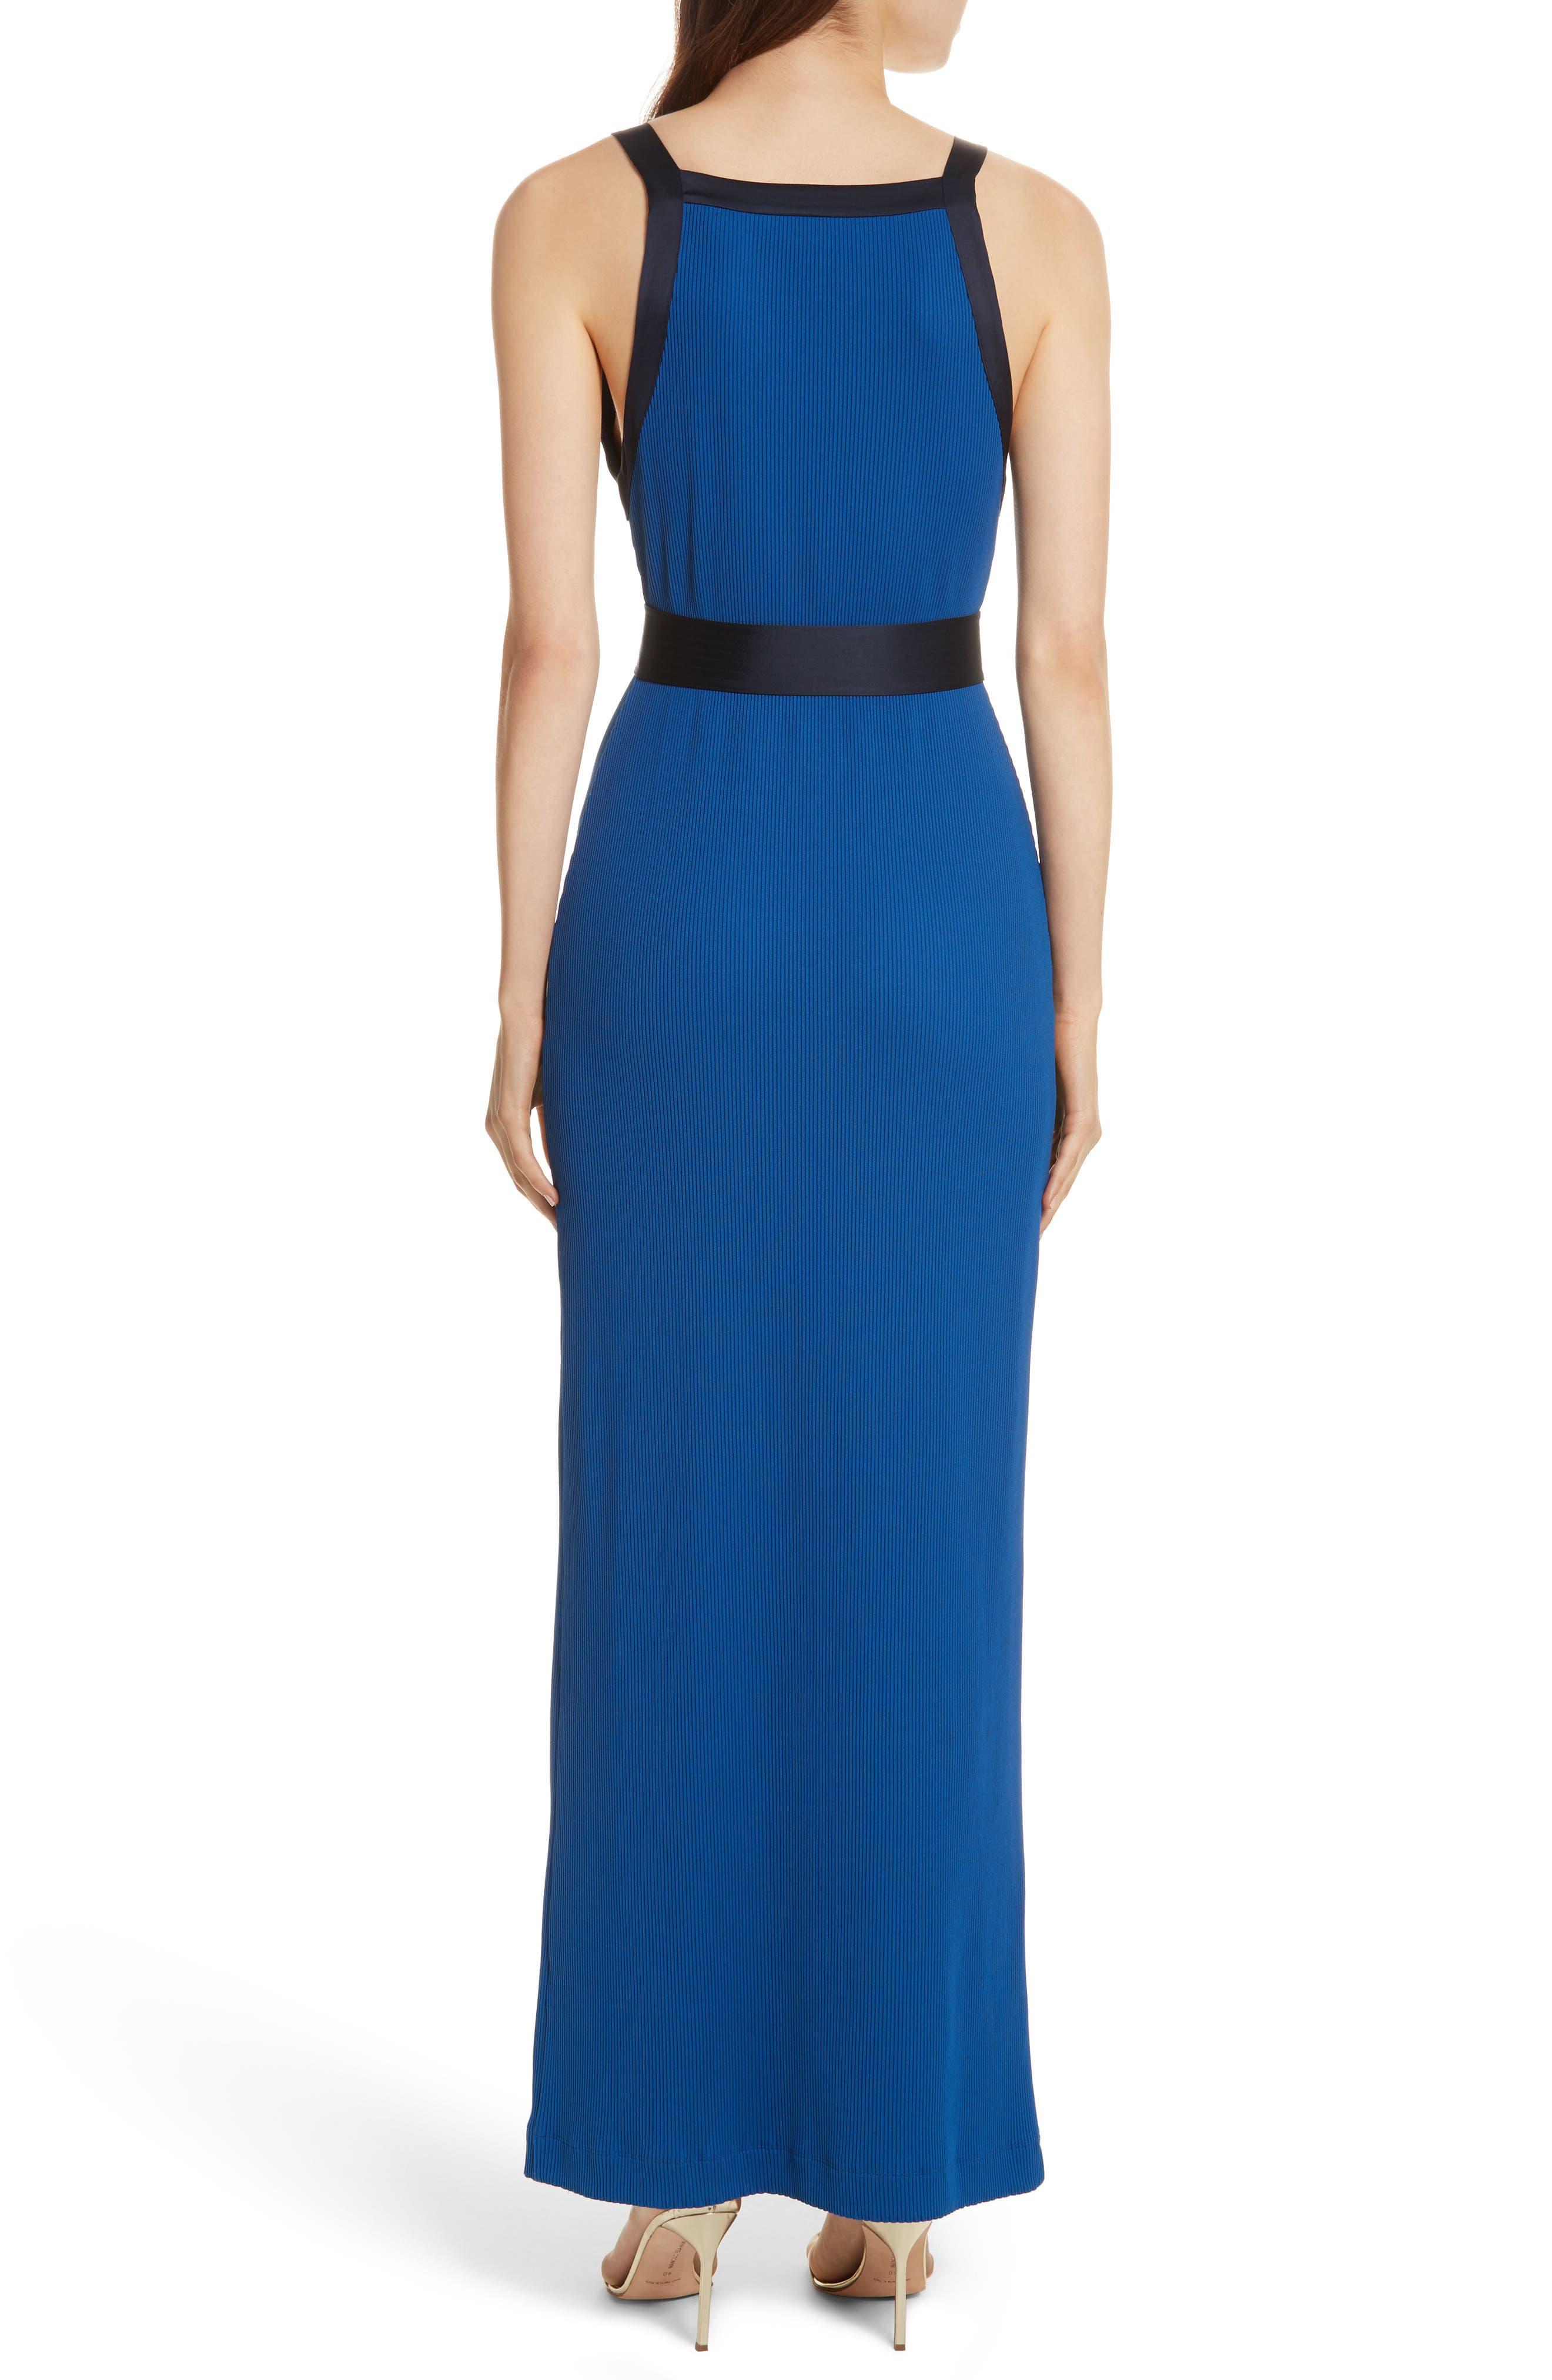 Diane von Furstenberg Ribbed Jersey Maxi Dress,                             Alternate thumbnail 2, color,                             412